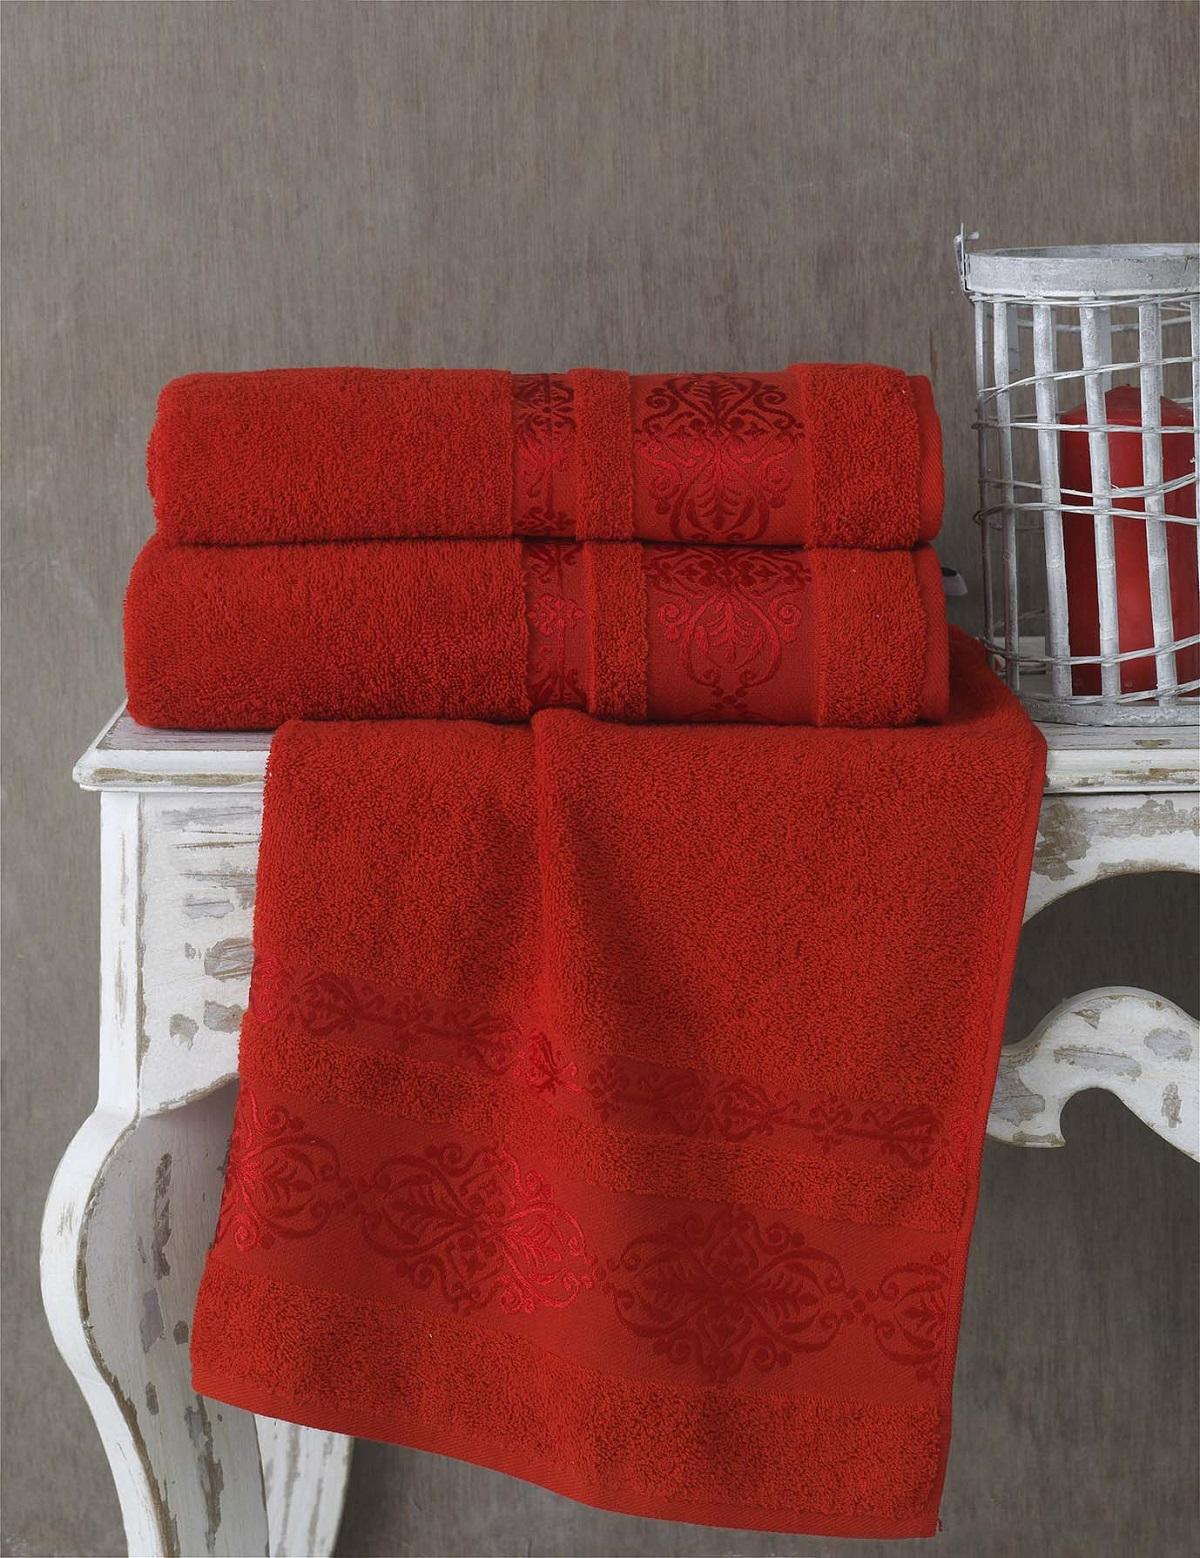 Полотенца Karna Полотенце Rebeka Цвет: Красный (70х140 см) karna karna полотенце innes цвет красный 70х140 см